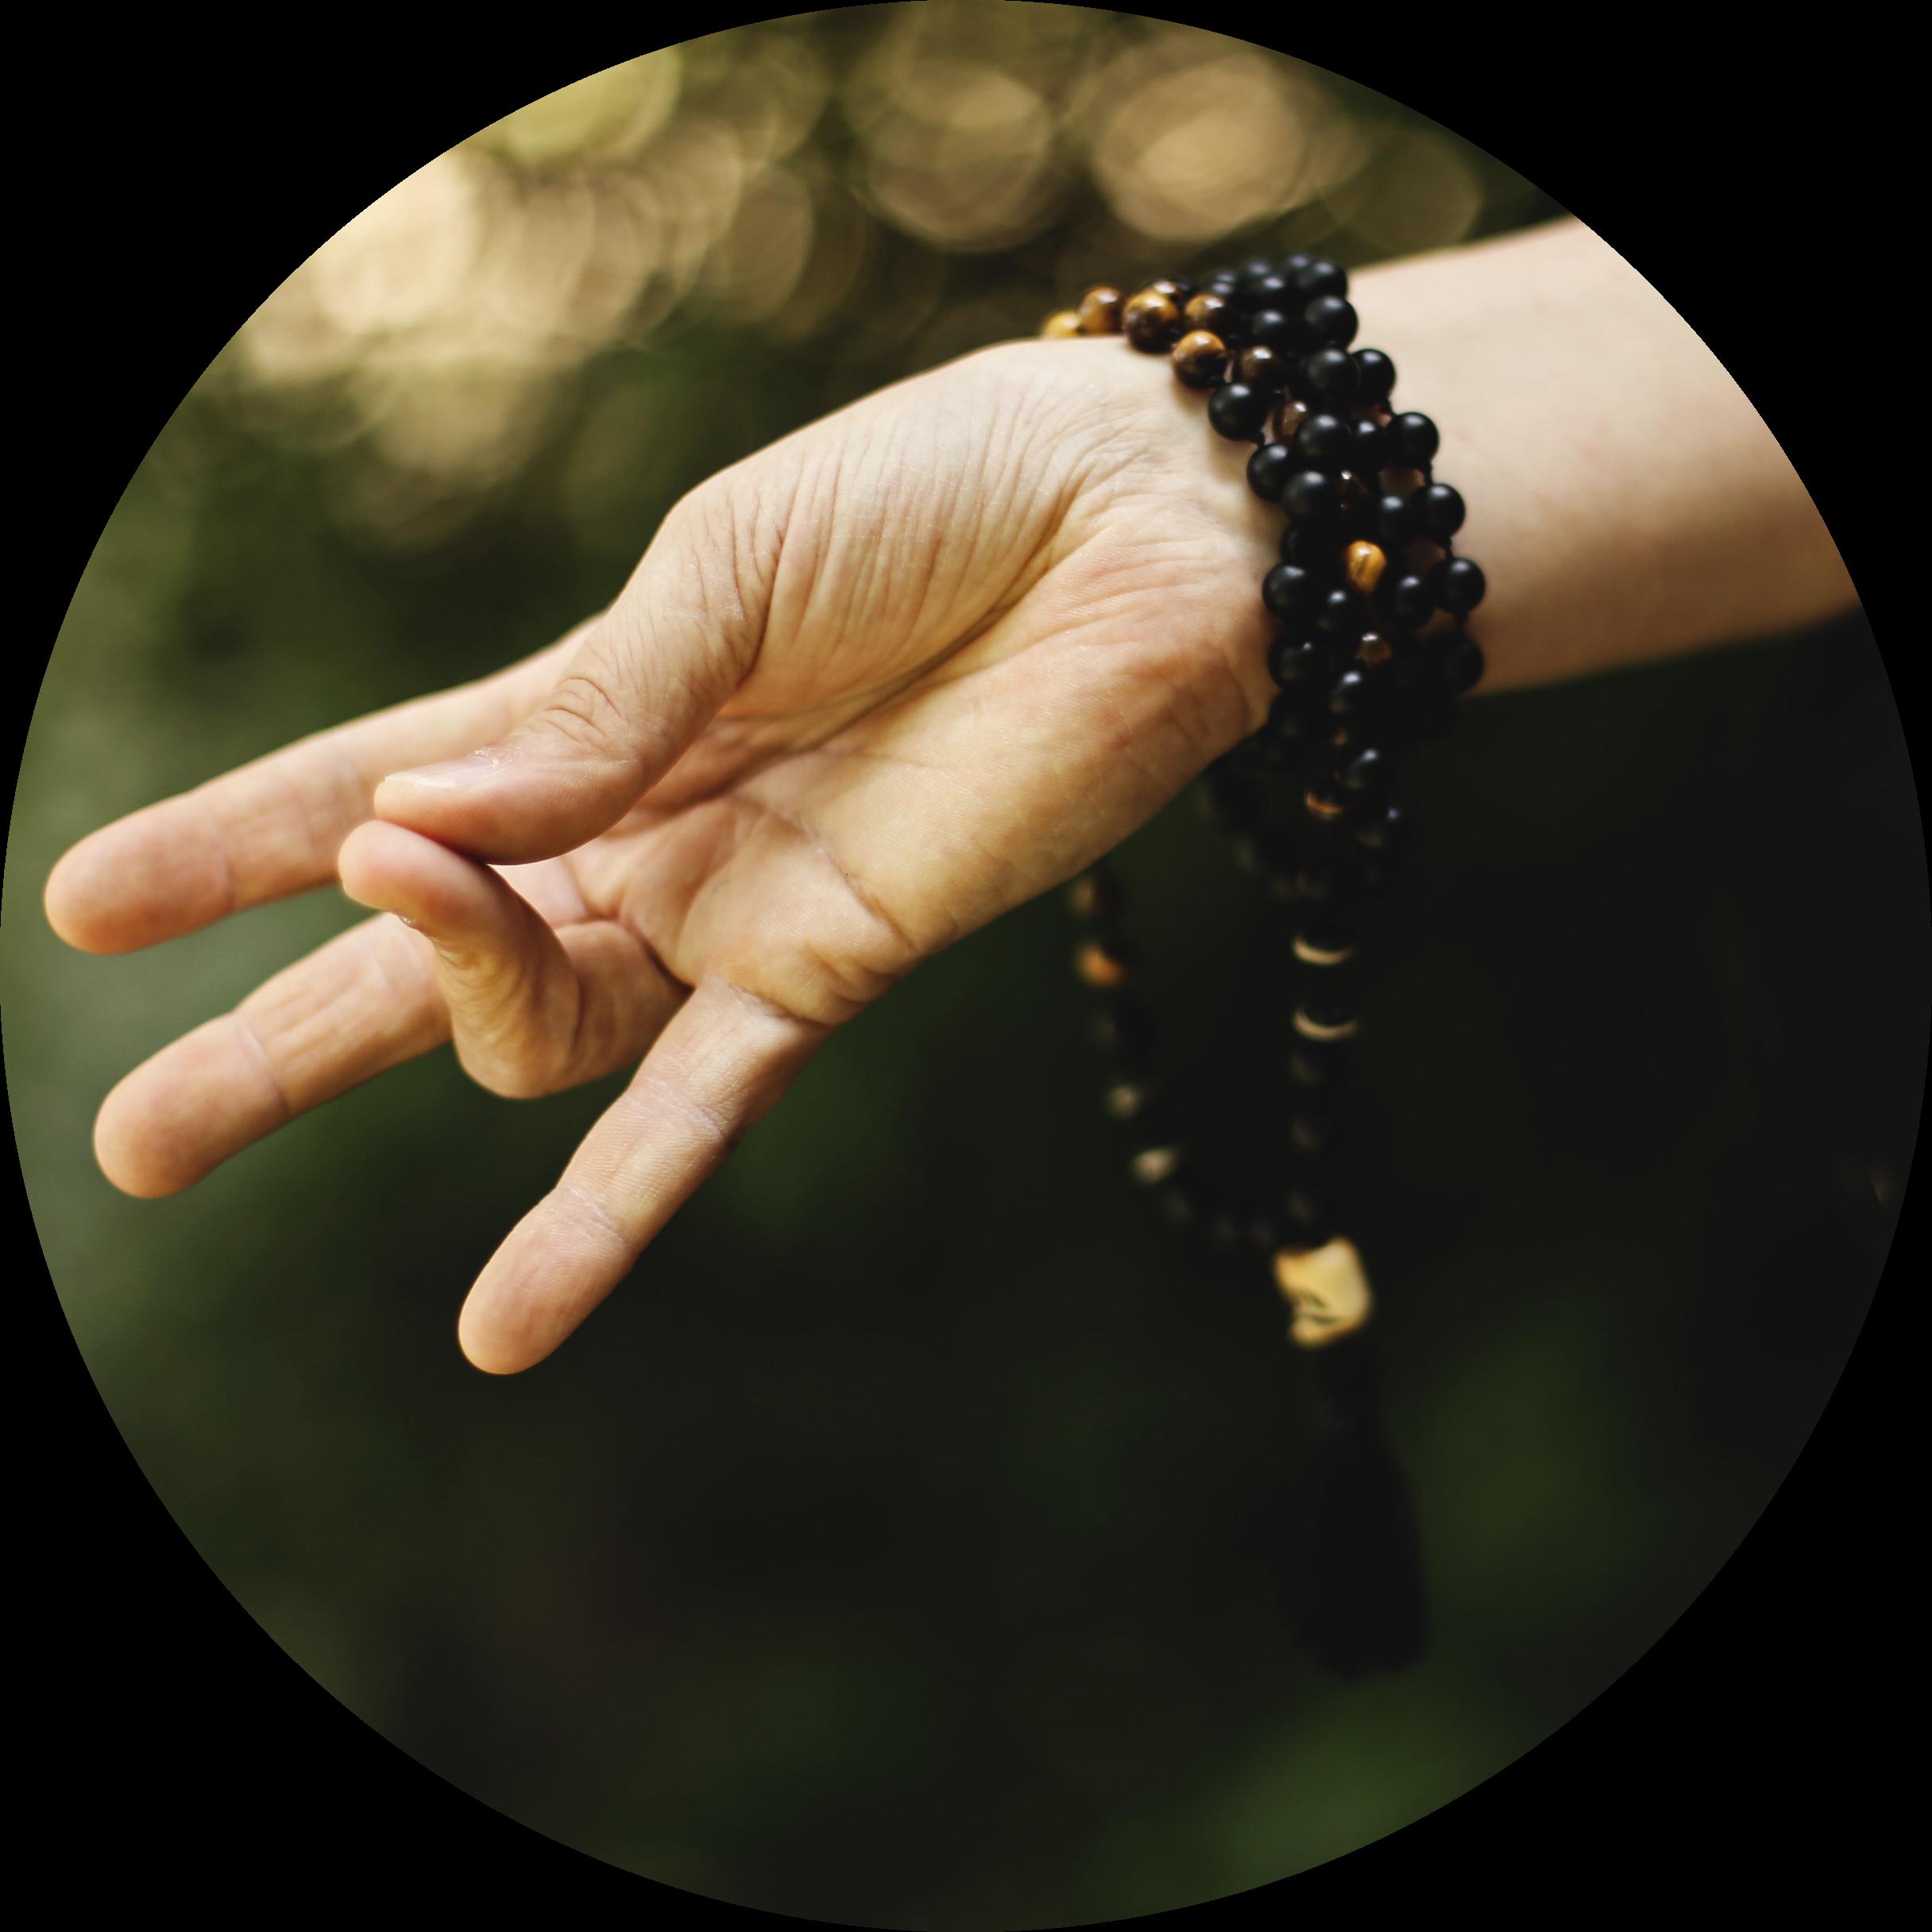 A Heart Meditation Day for Modern Mystics